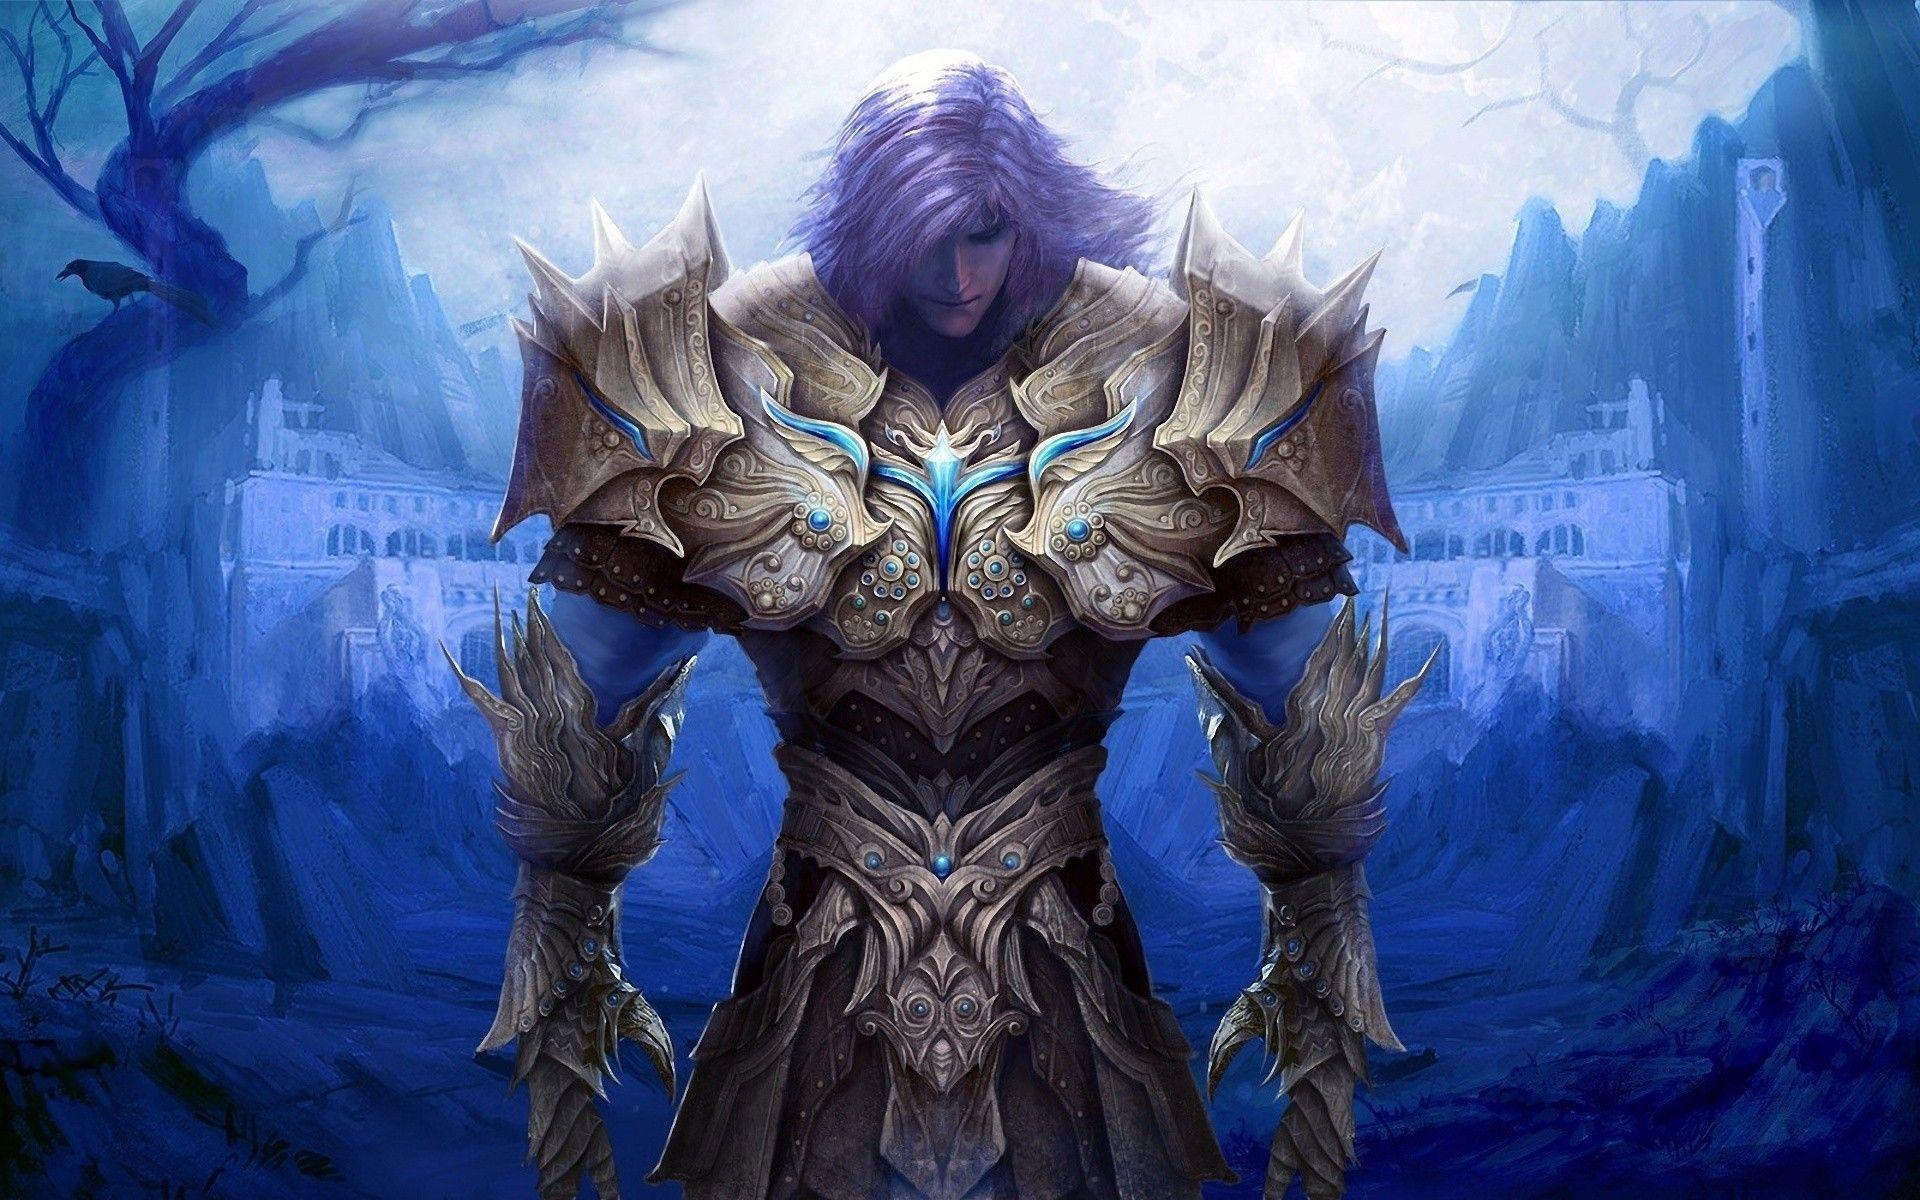 World Of Warcraft Paladin Wallpaper 1440 900 Wow Paladin Wallpaper 44 Wallpapers Adorable Wallpapers Warrior Images Warriors Wallpaper Fantasy Warrior